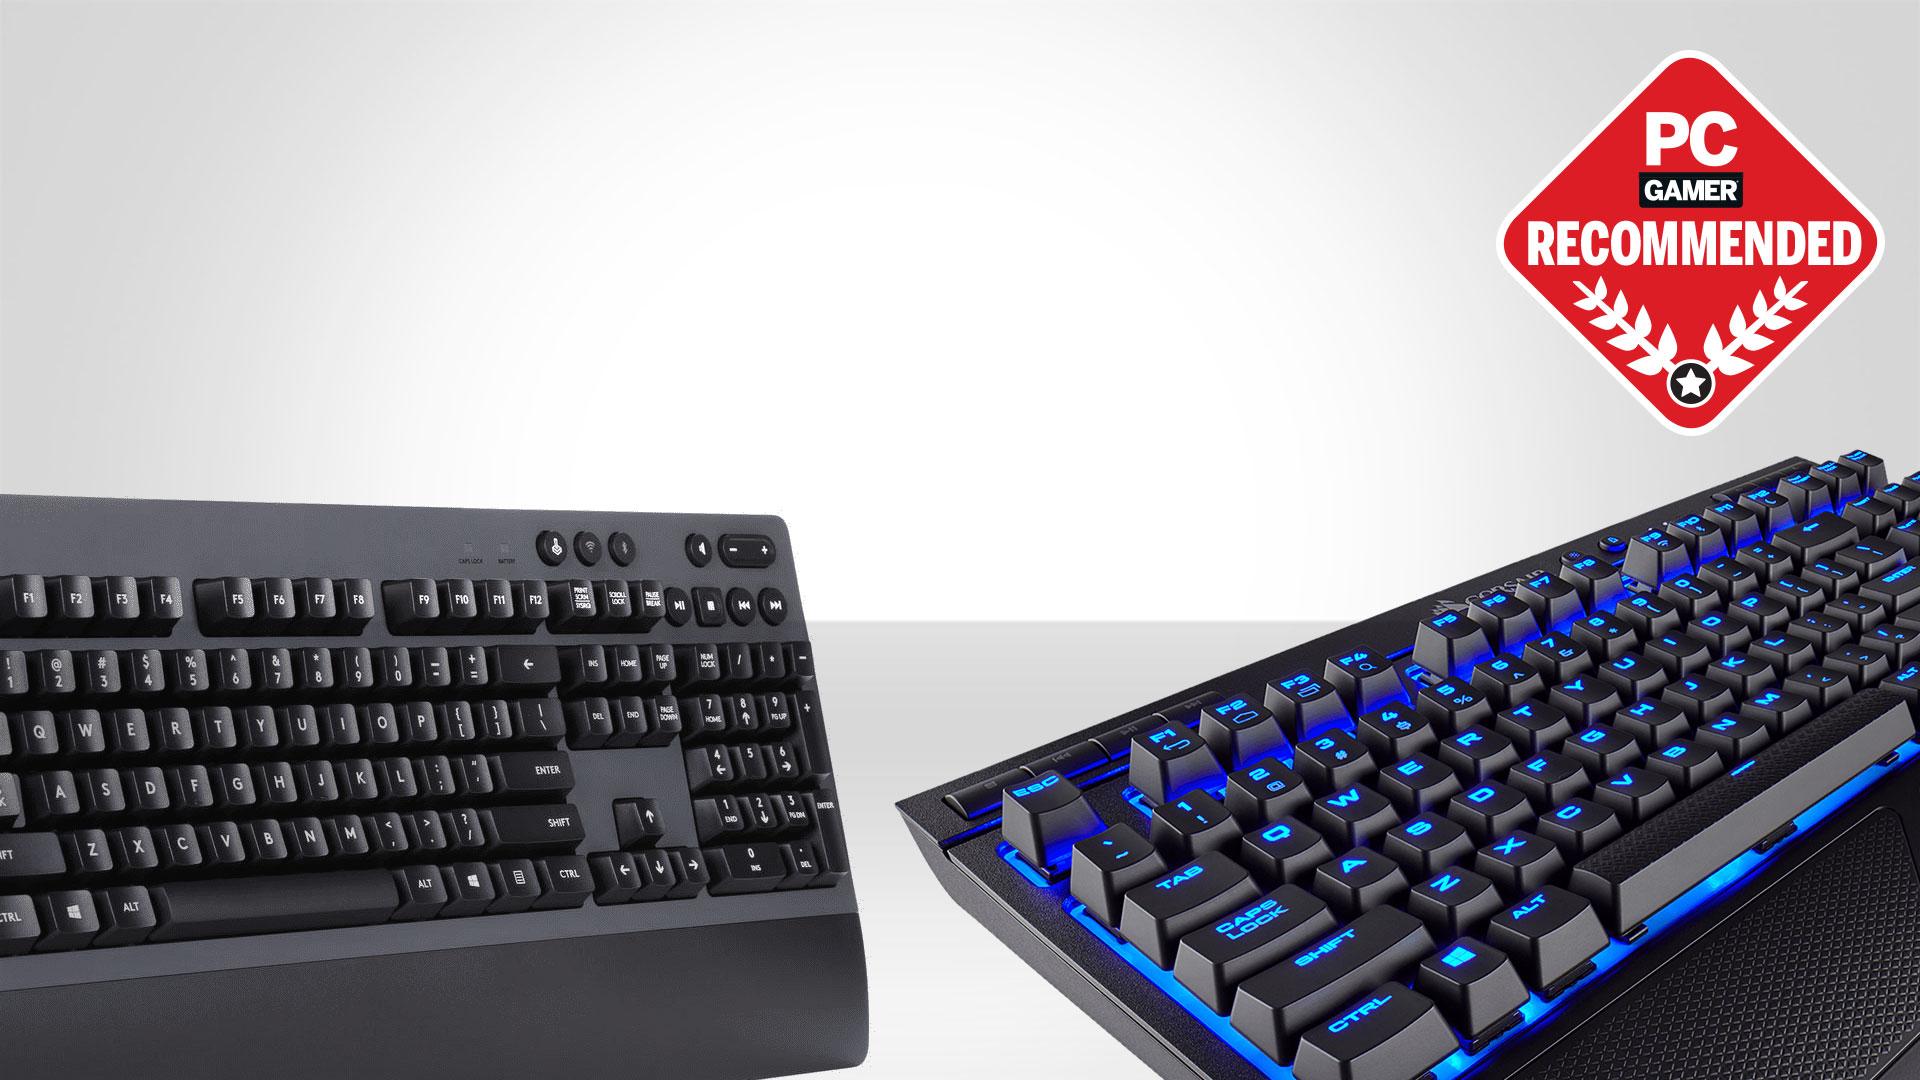 Best Wireless Gaming Keyboard In 2020 Pc Gamer